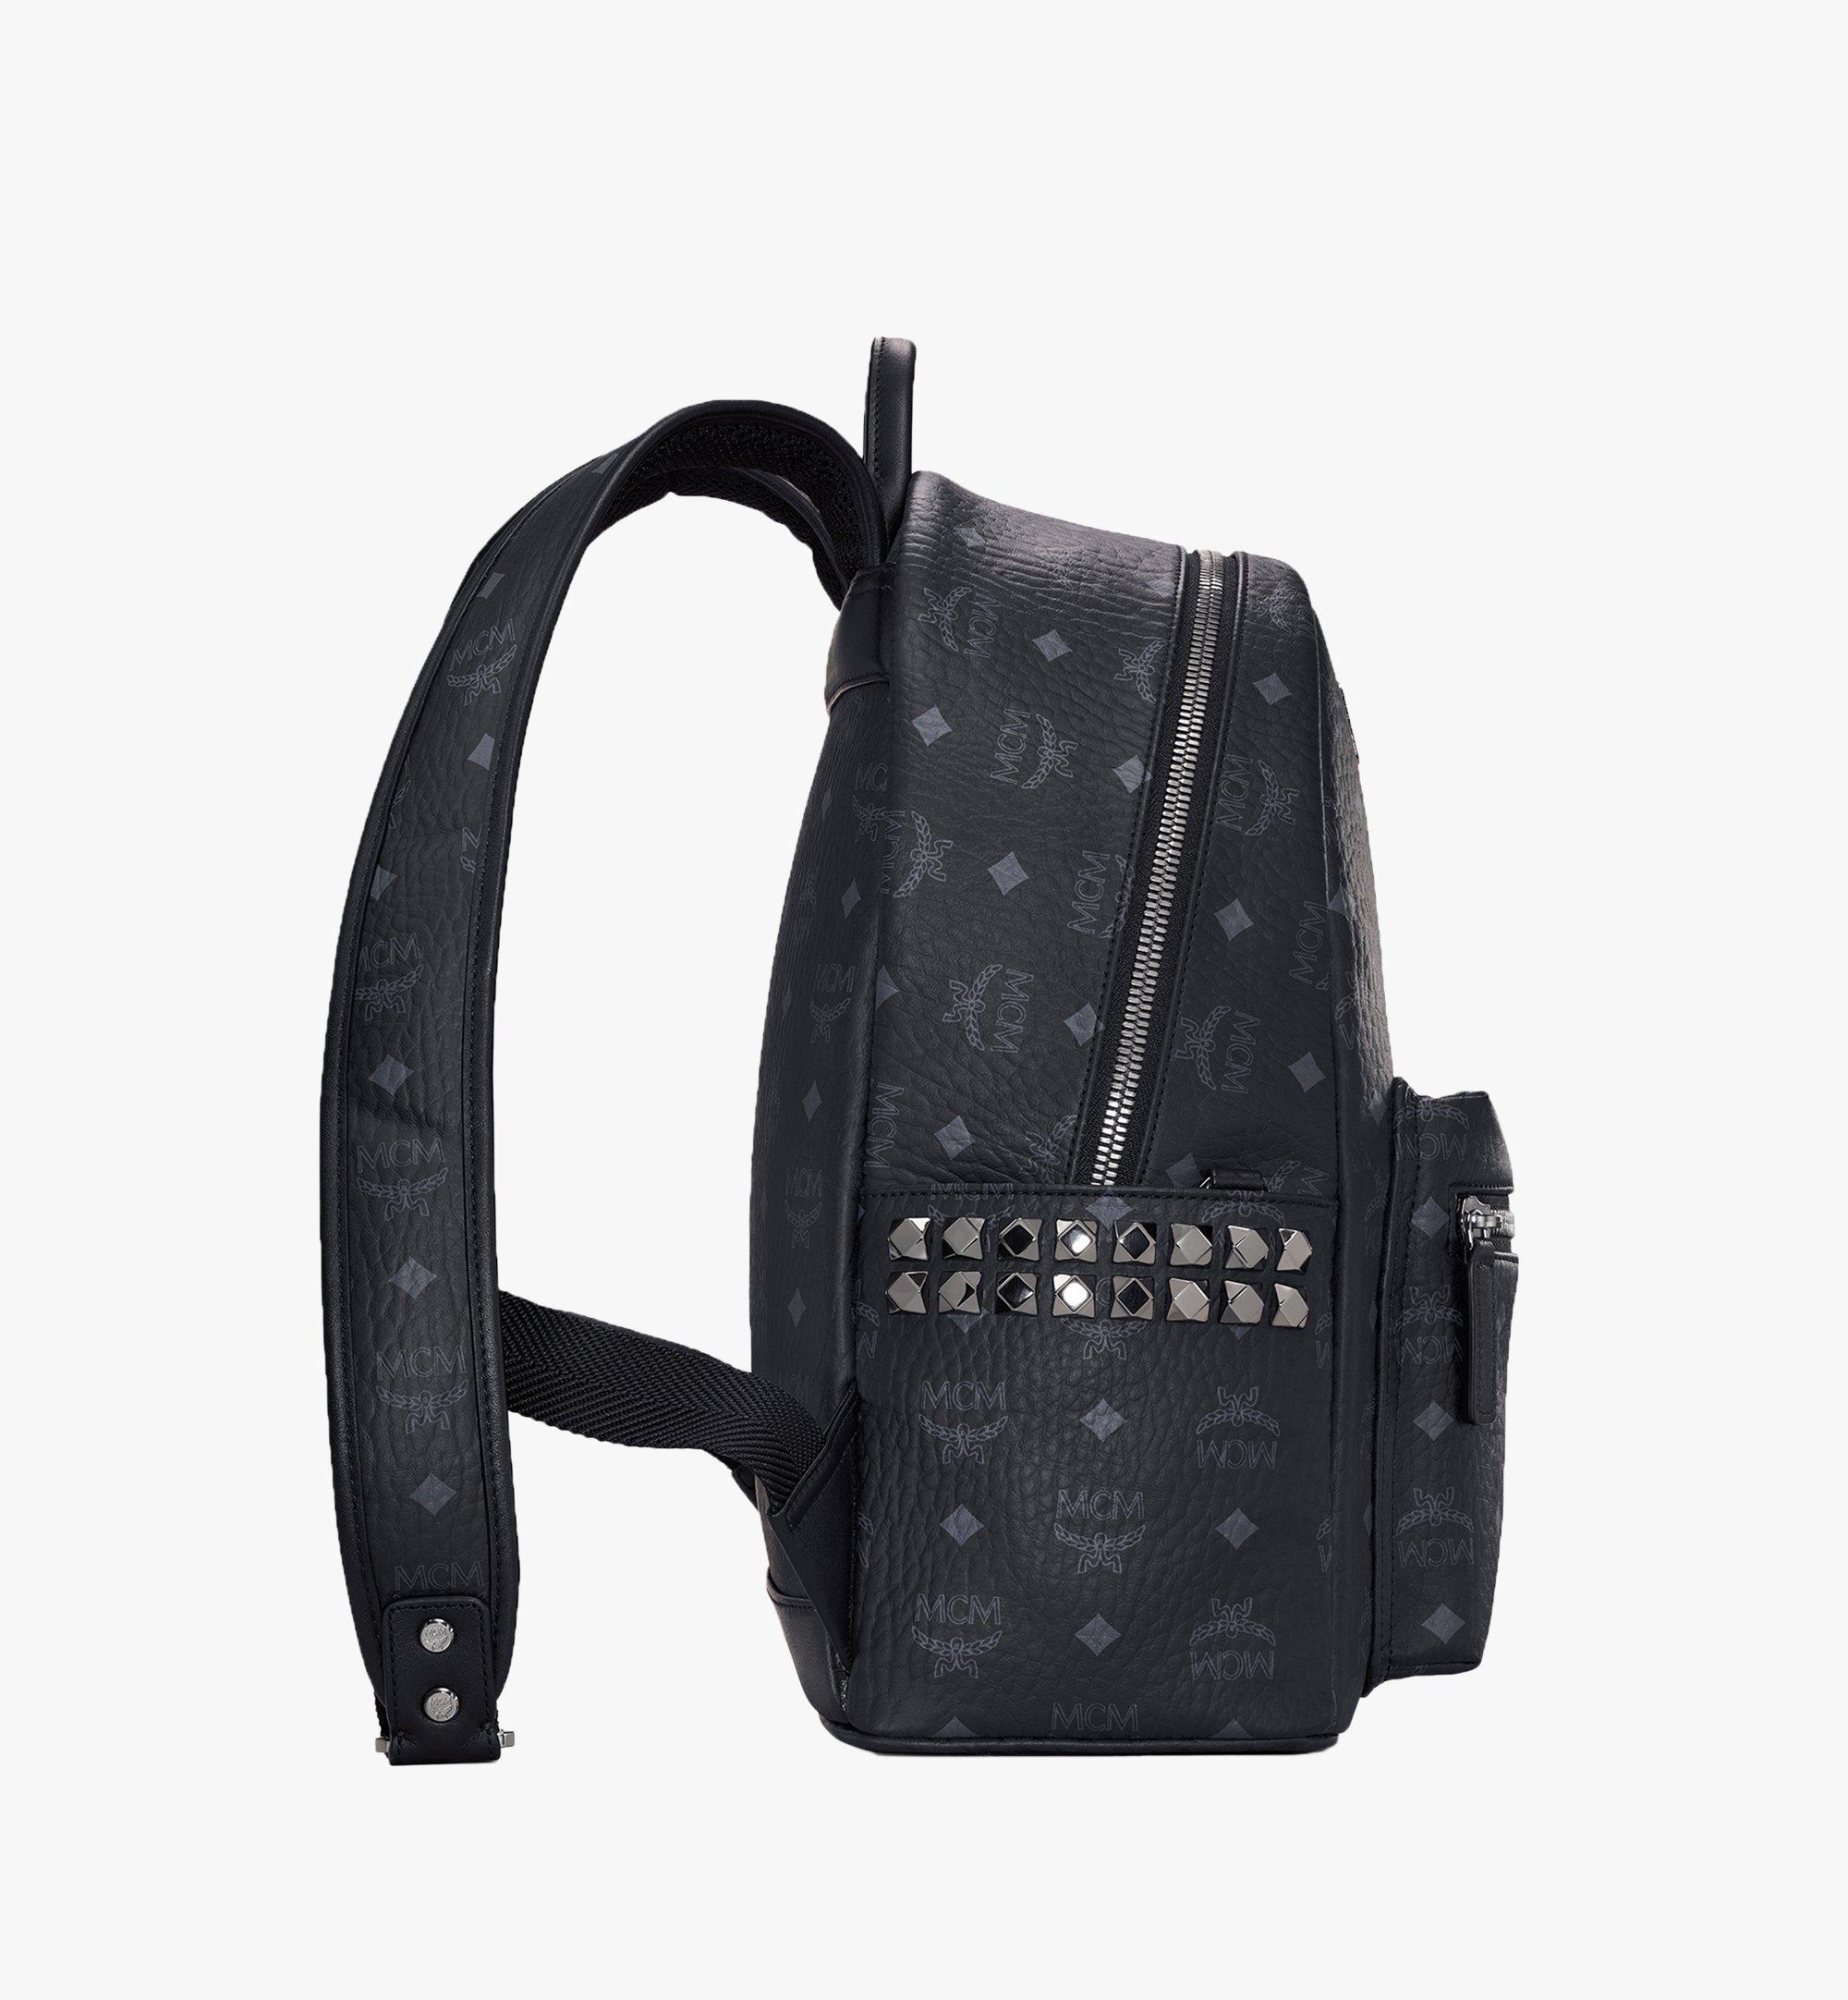 MCM Stark Visetos 侧边铆钉双肩背包 Black MMK7AVE99BK001 更多视角 1